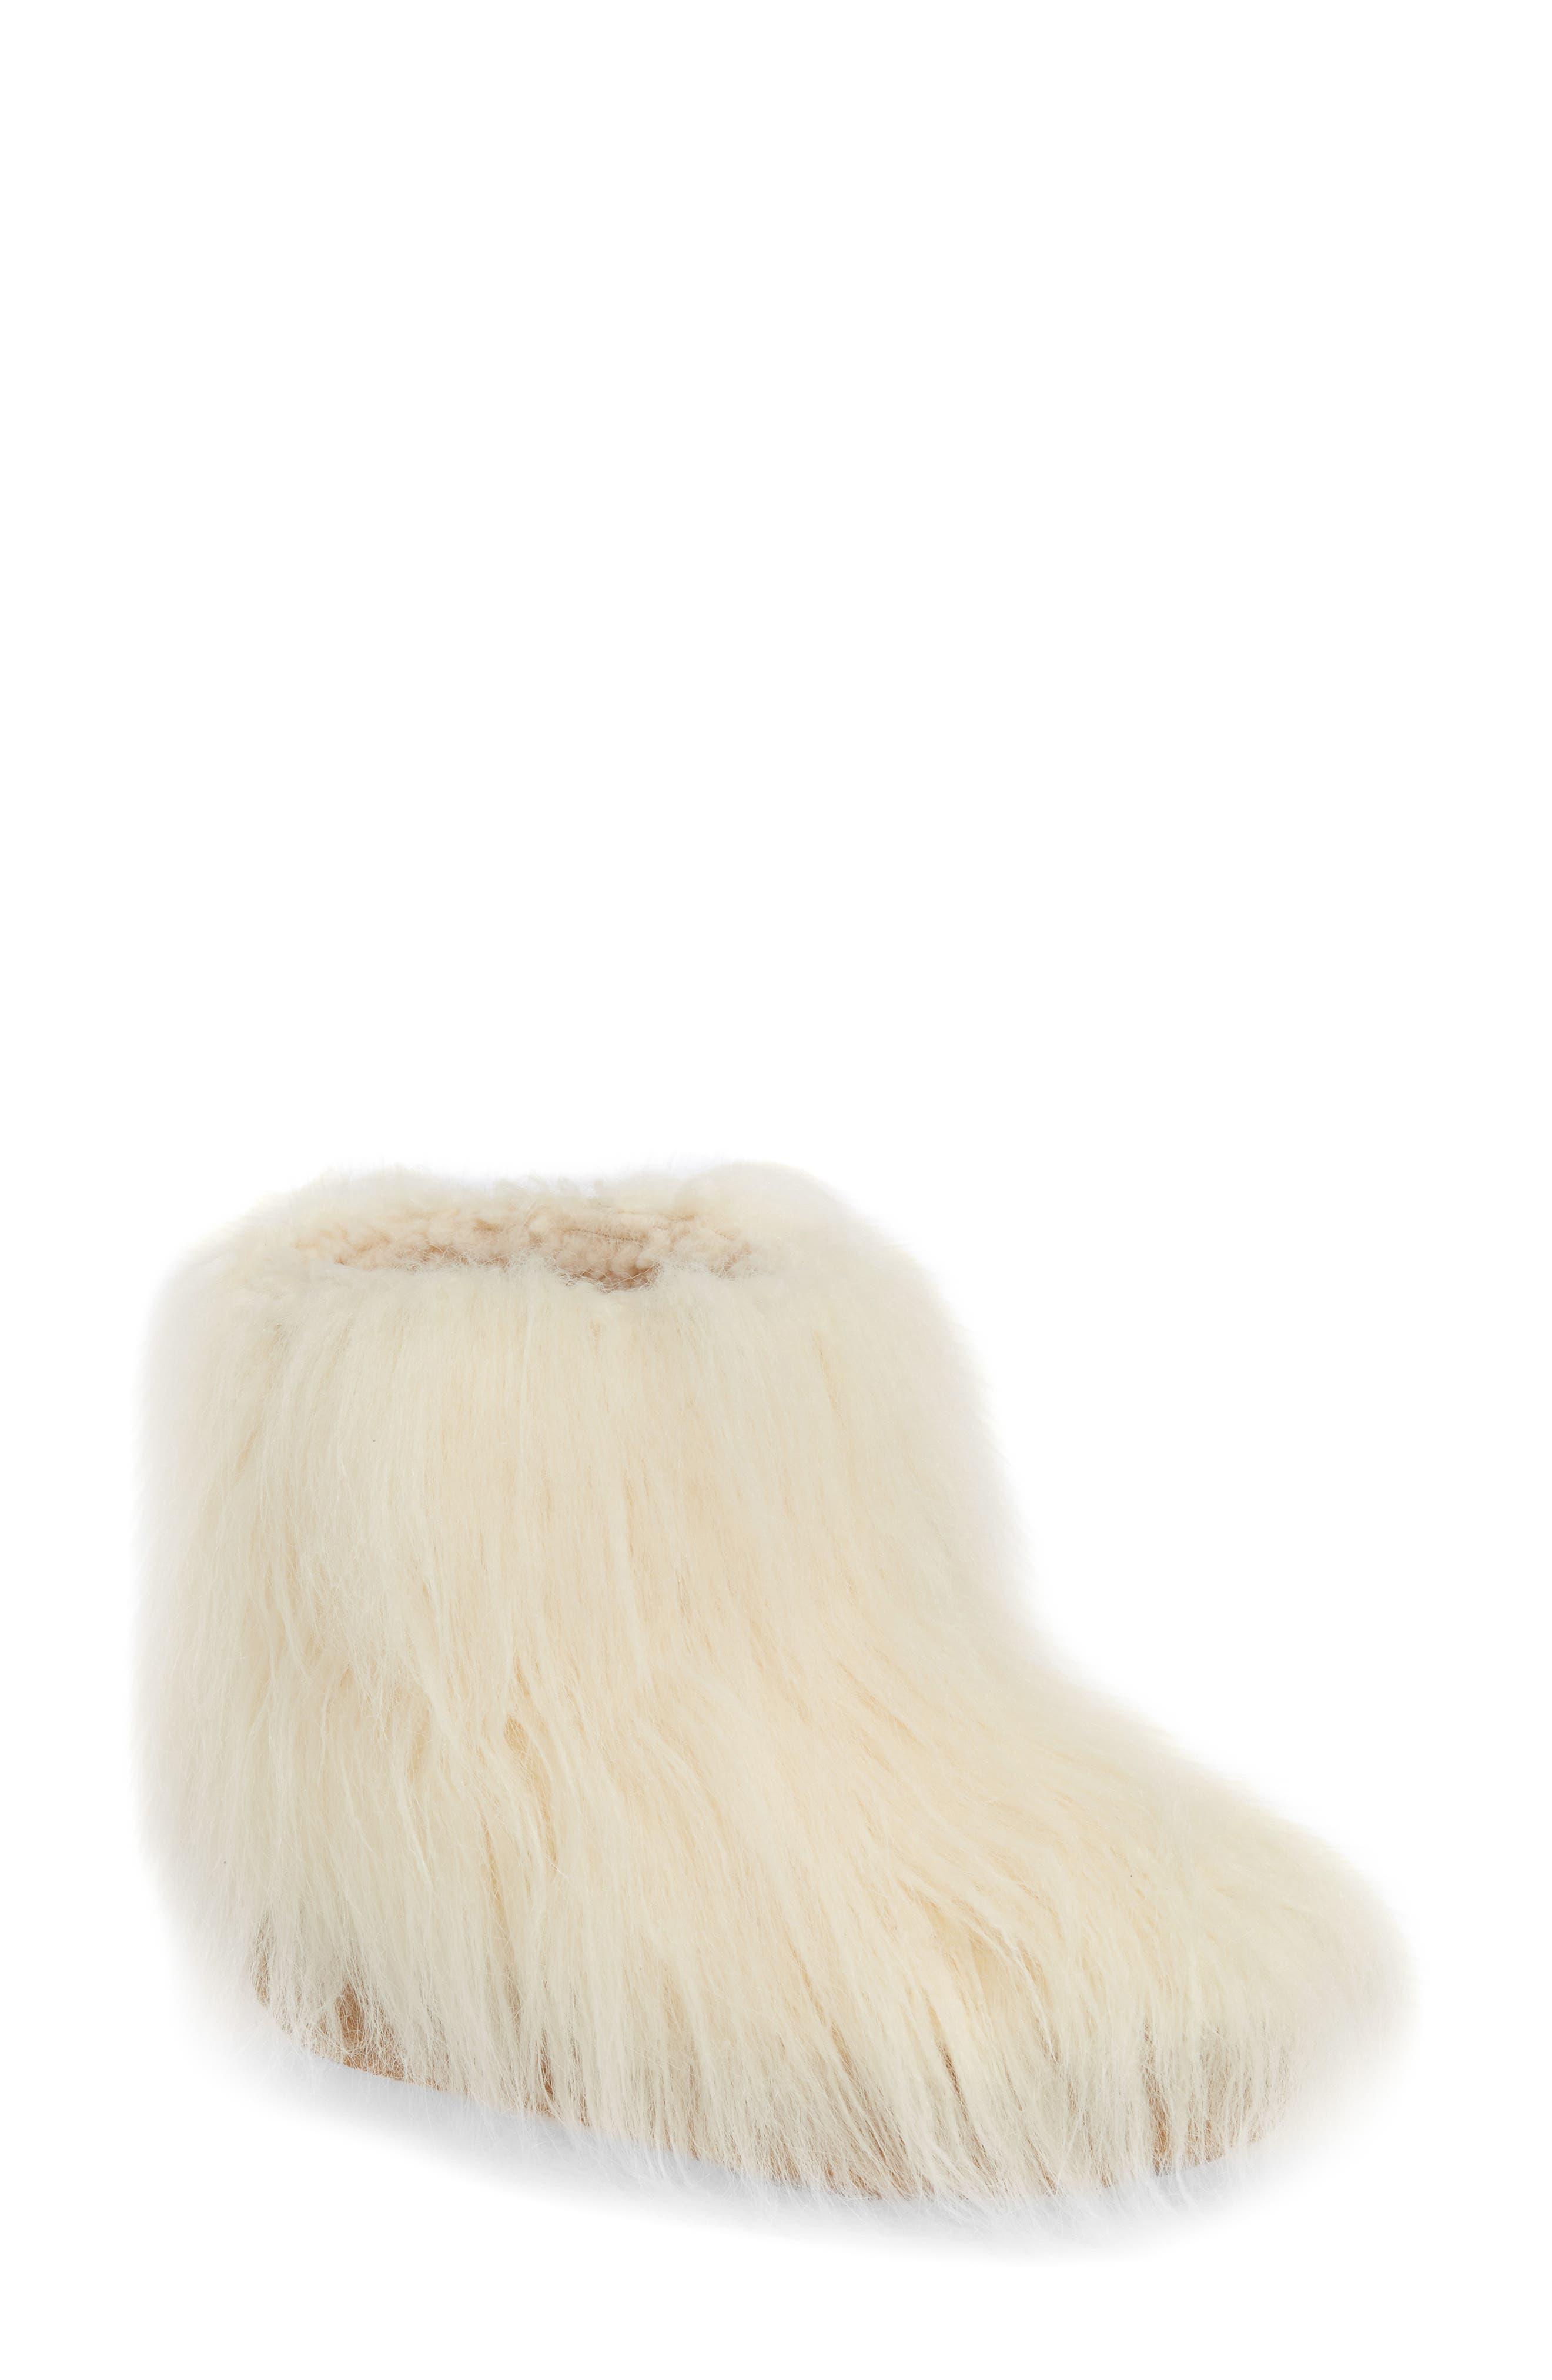 JEFFREY CAMPBELL Fluffy Faux Fur Bootie in White Faux Fur